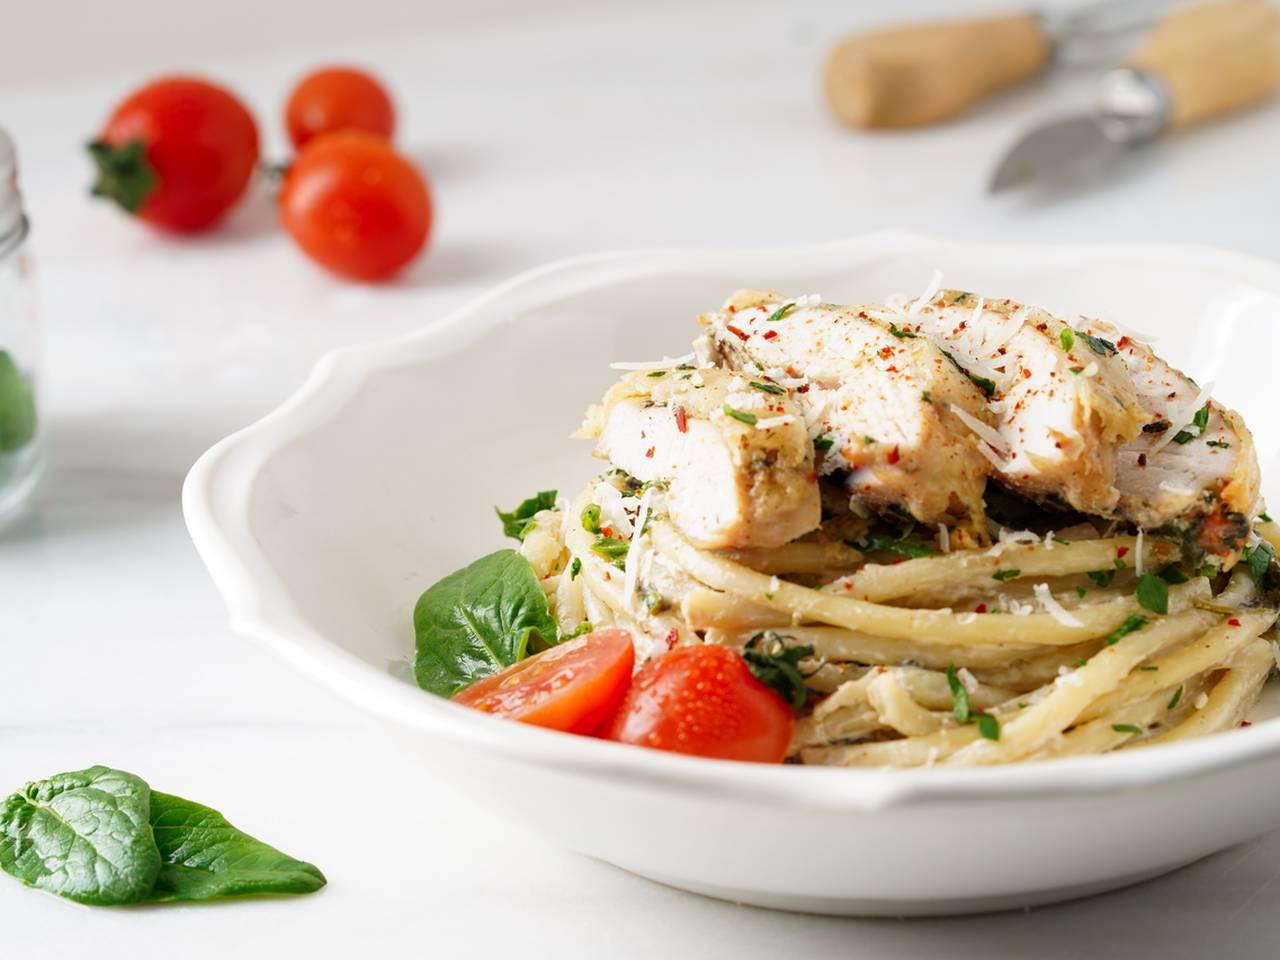 Baked Creamy Spinach Chicken Parmesan Recipe